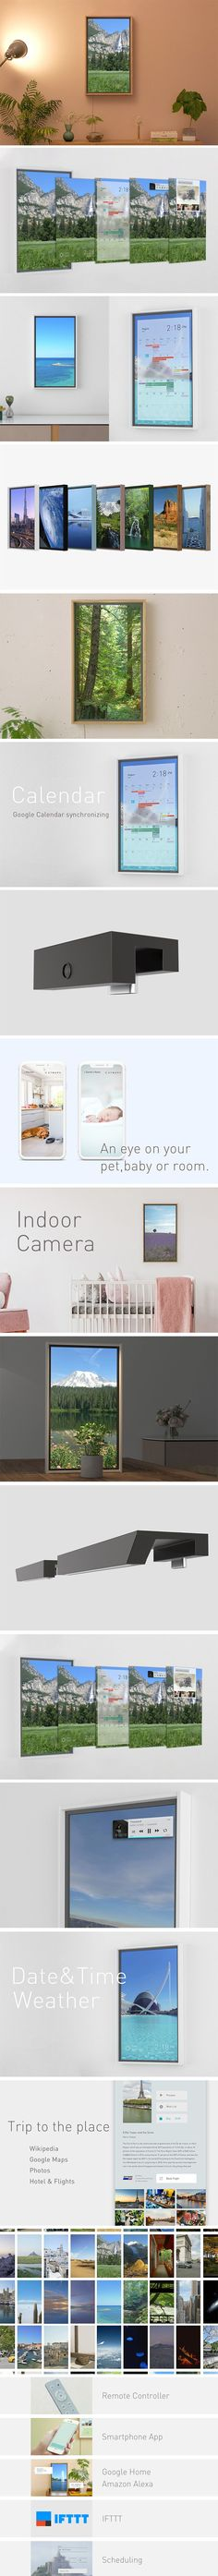 97 Best YD Interior images in 2019 | Architecture interior design